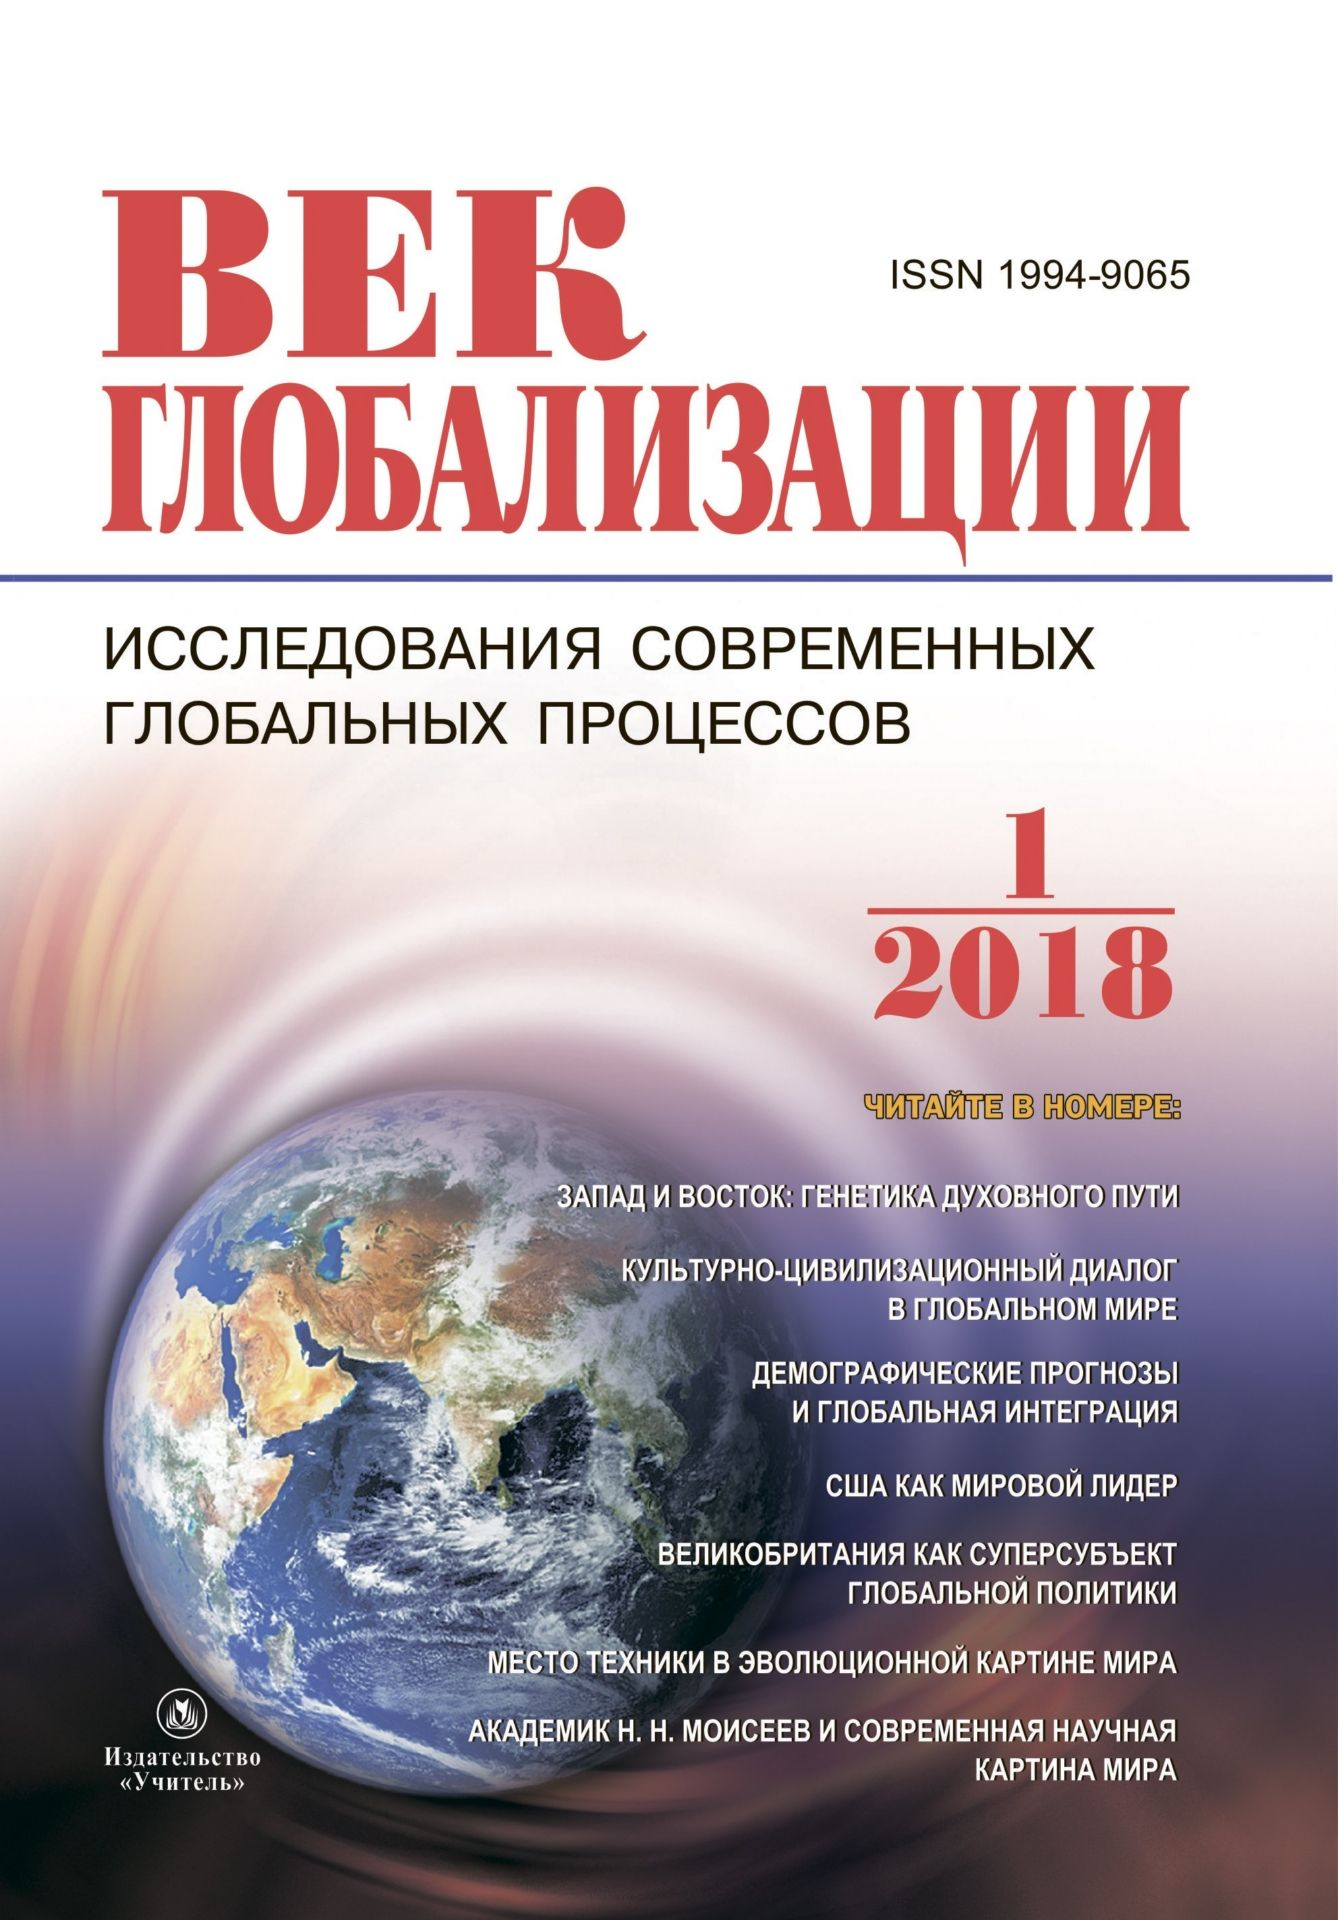 Журнал Век глобализации № 1 2018